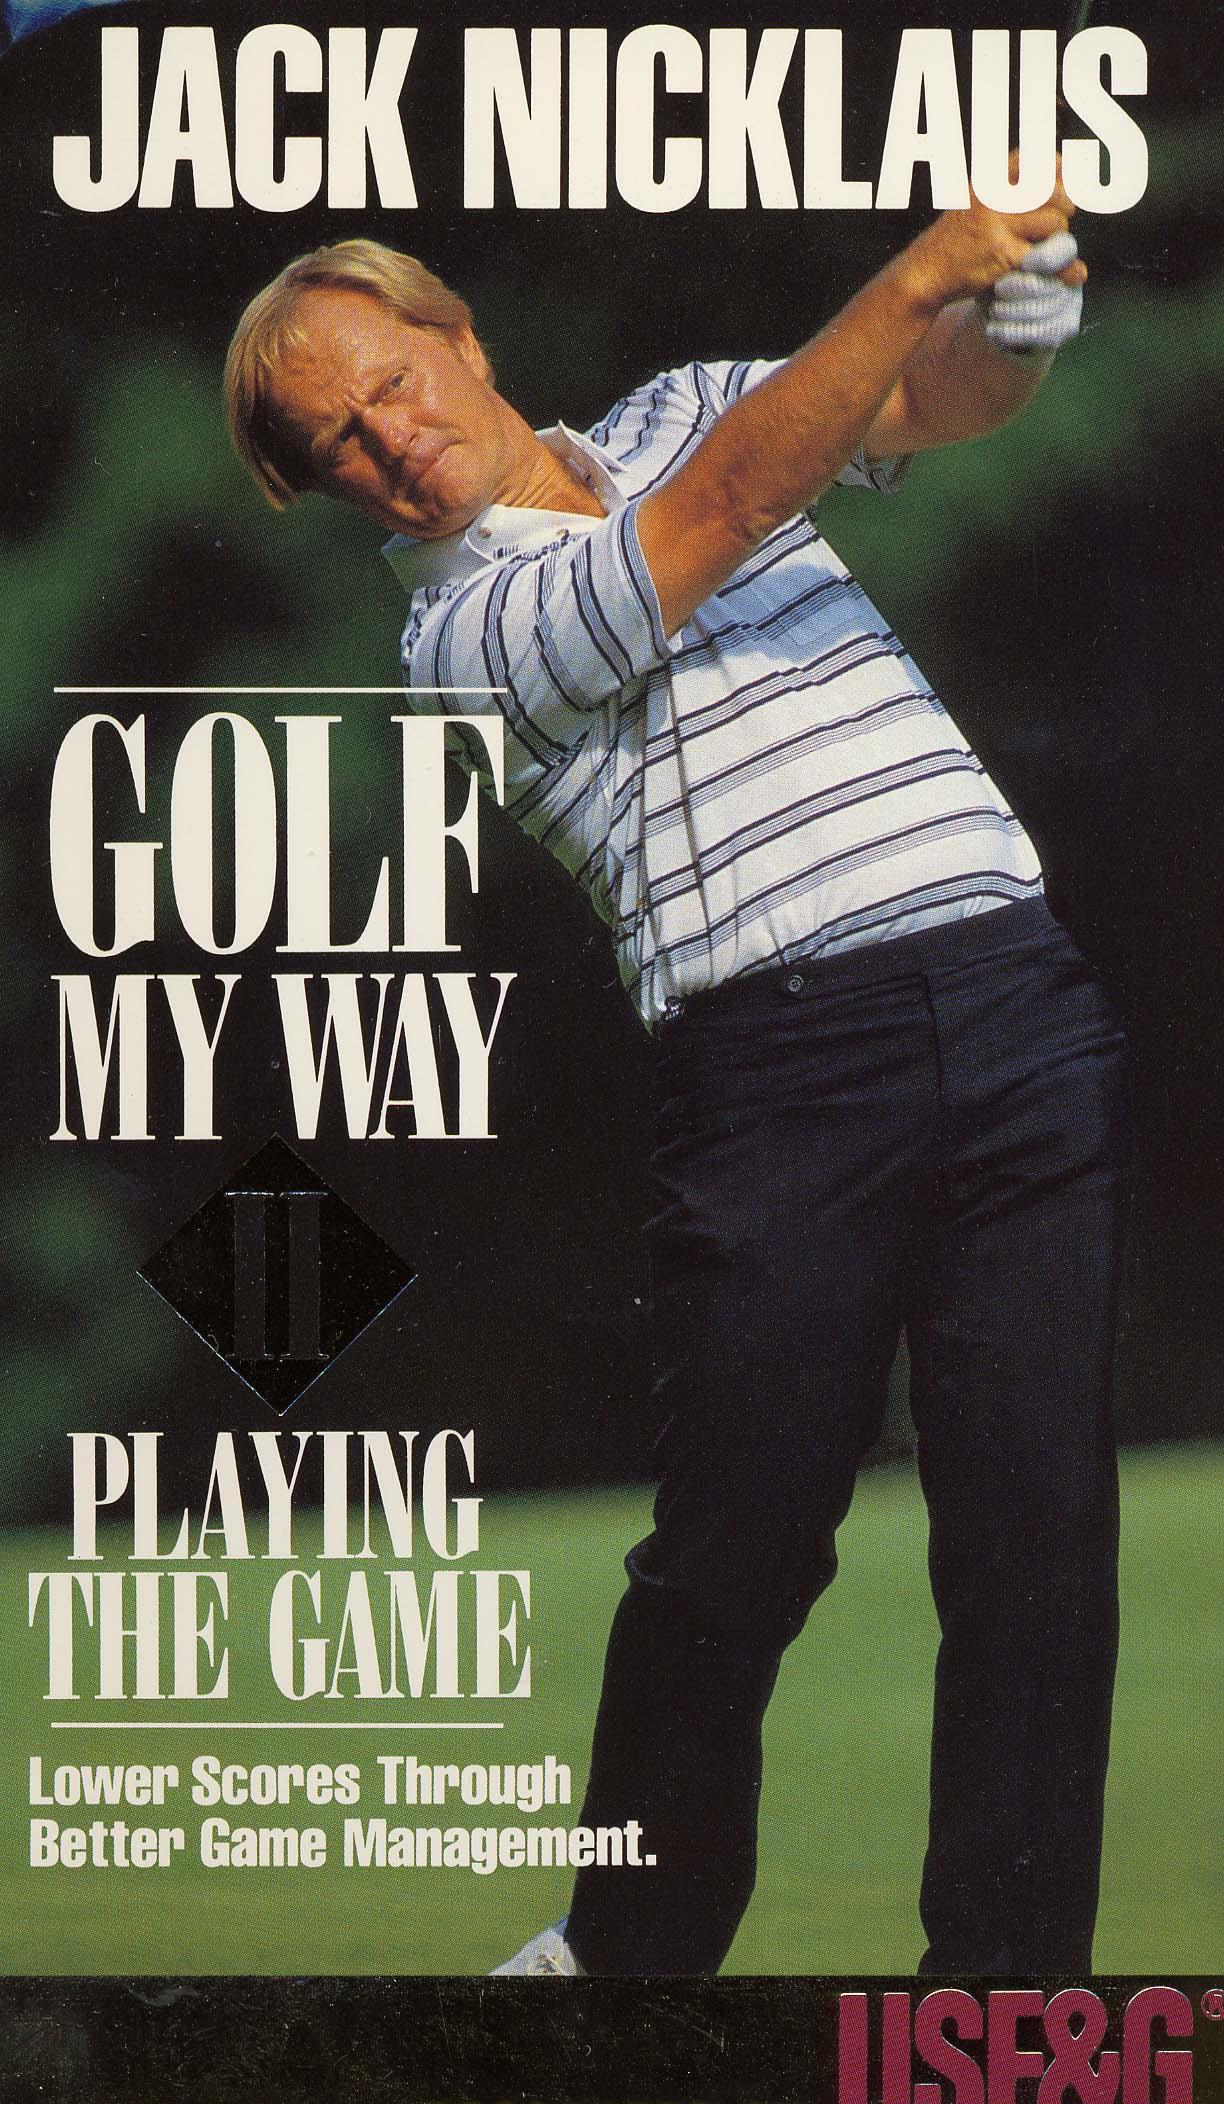 Jack Nicklaus: SP100 - Golf my Way